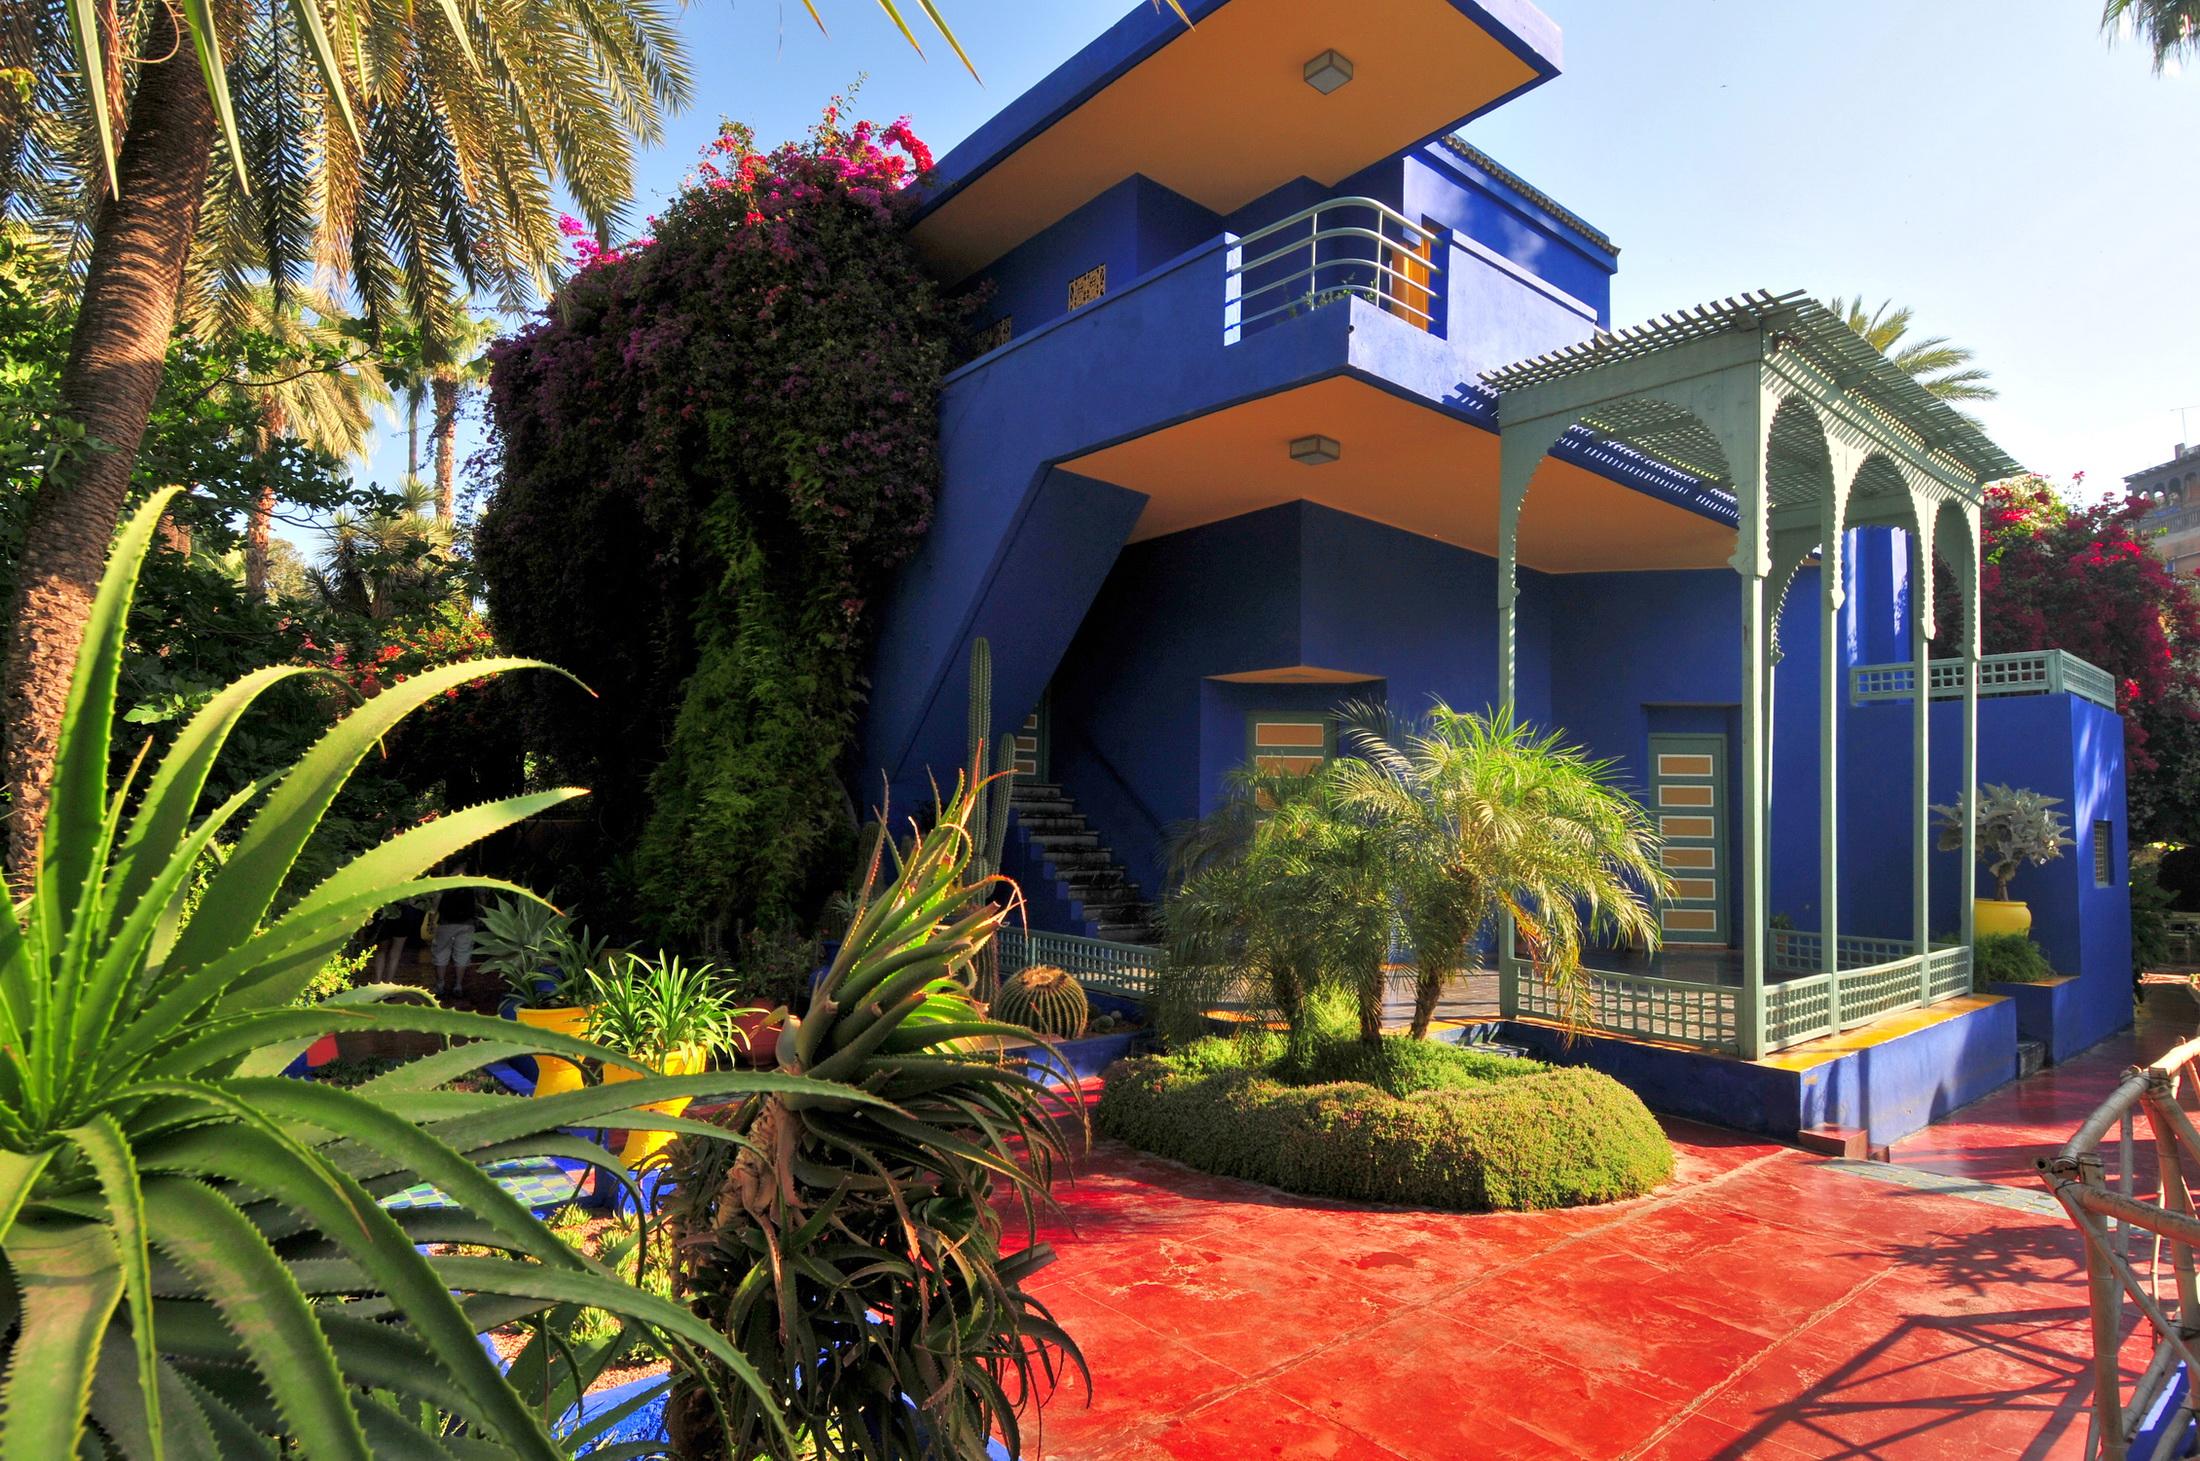 Morocco marrakech jardin majorelle fonds d 39 cran arri res plan 2200x1461 id 285405 - Fond d ecran jardin anglais ...